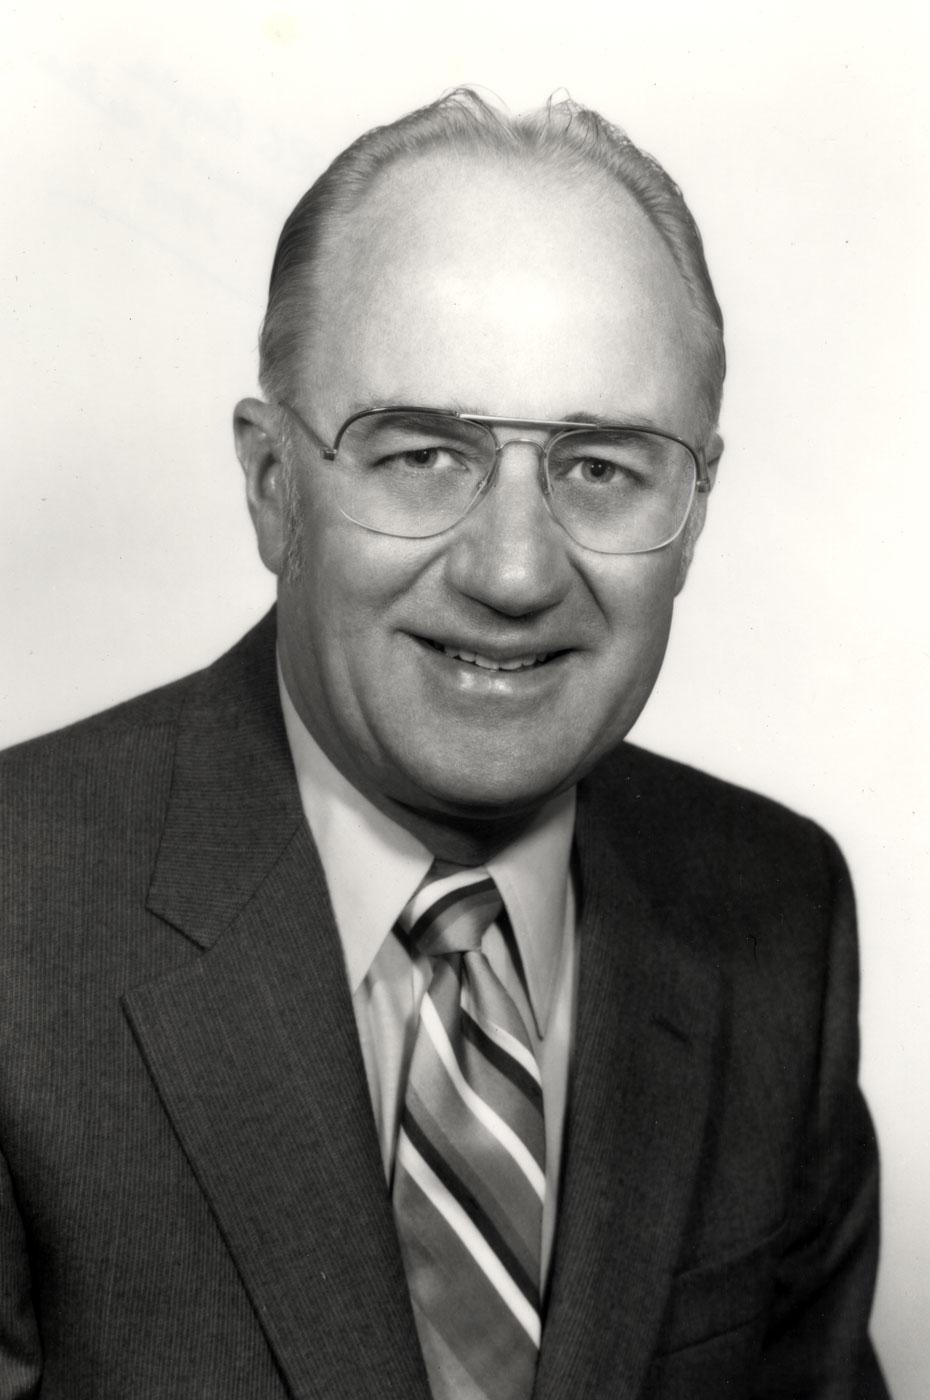 R. G. Congdon